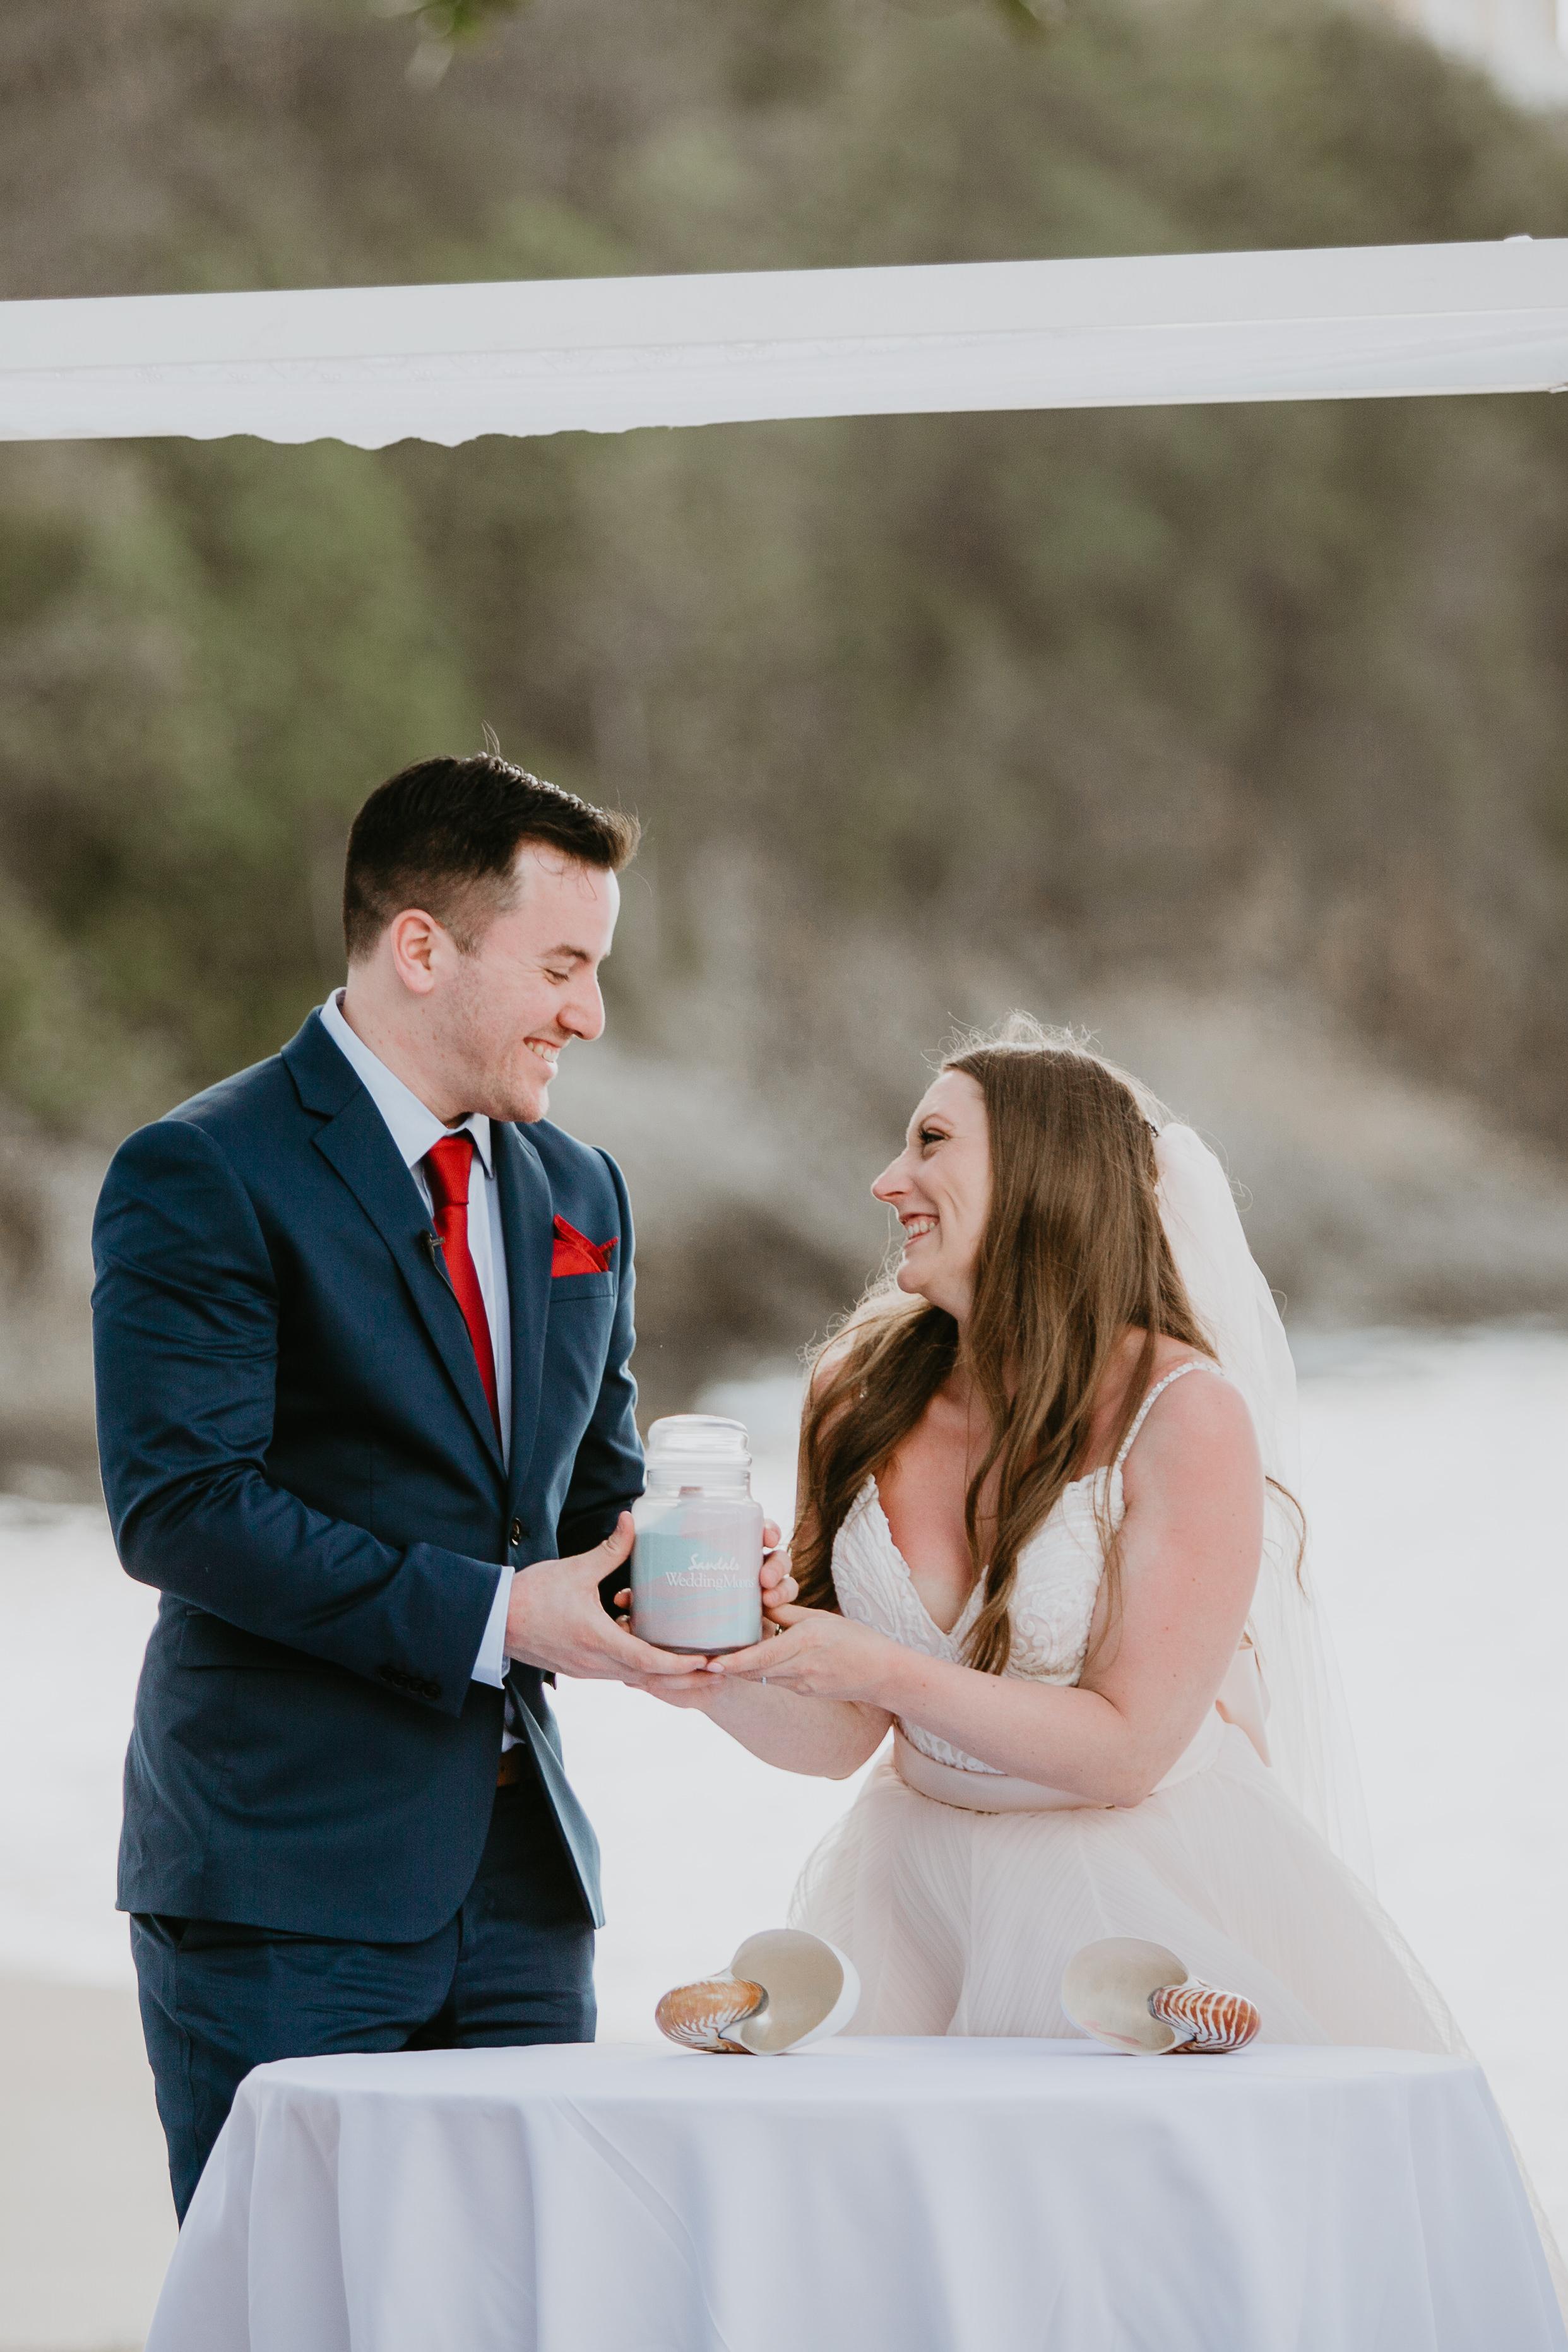 nicole-daacke-photography-destination-wedding-in-st-lucia-sandals-la-toc-intimate-island-wedding-carribean-elopement-photographer-chill-island-wedding-72.jpg